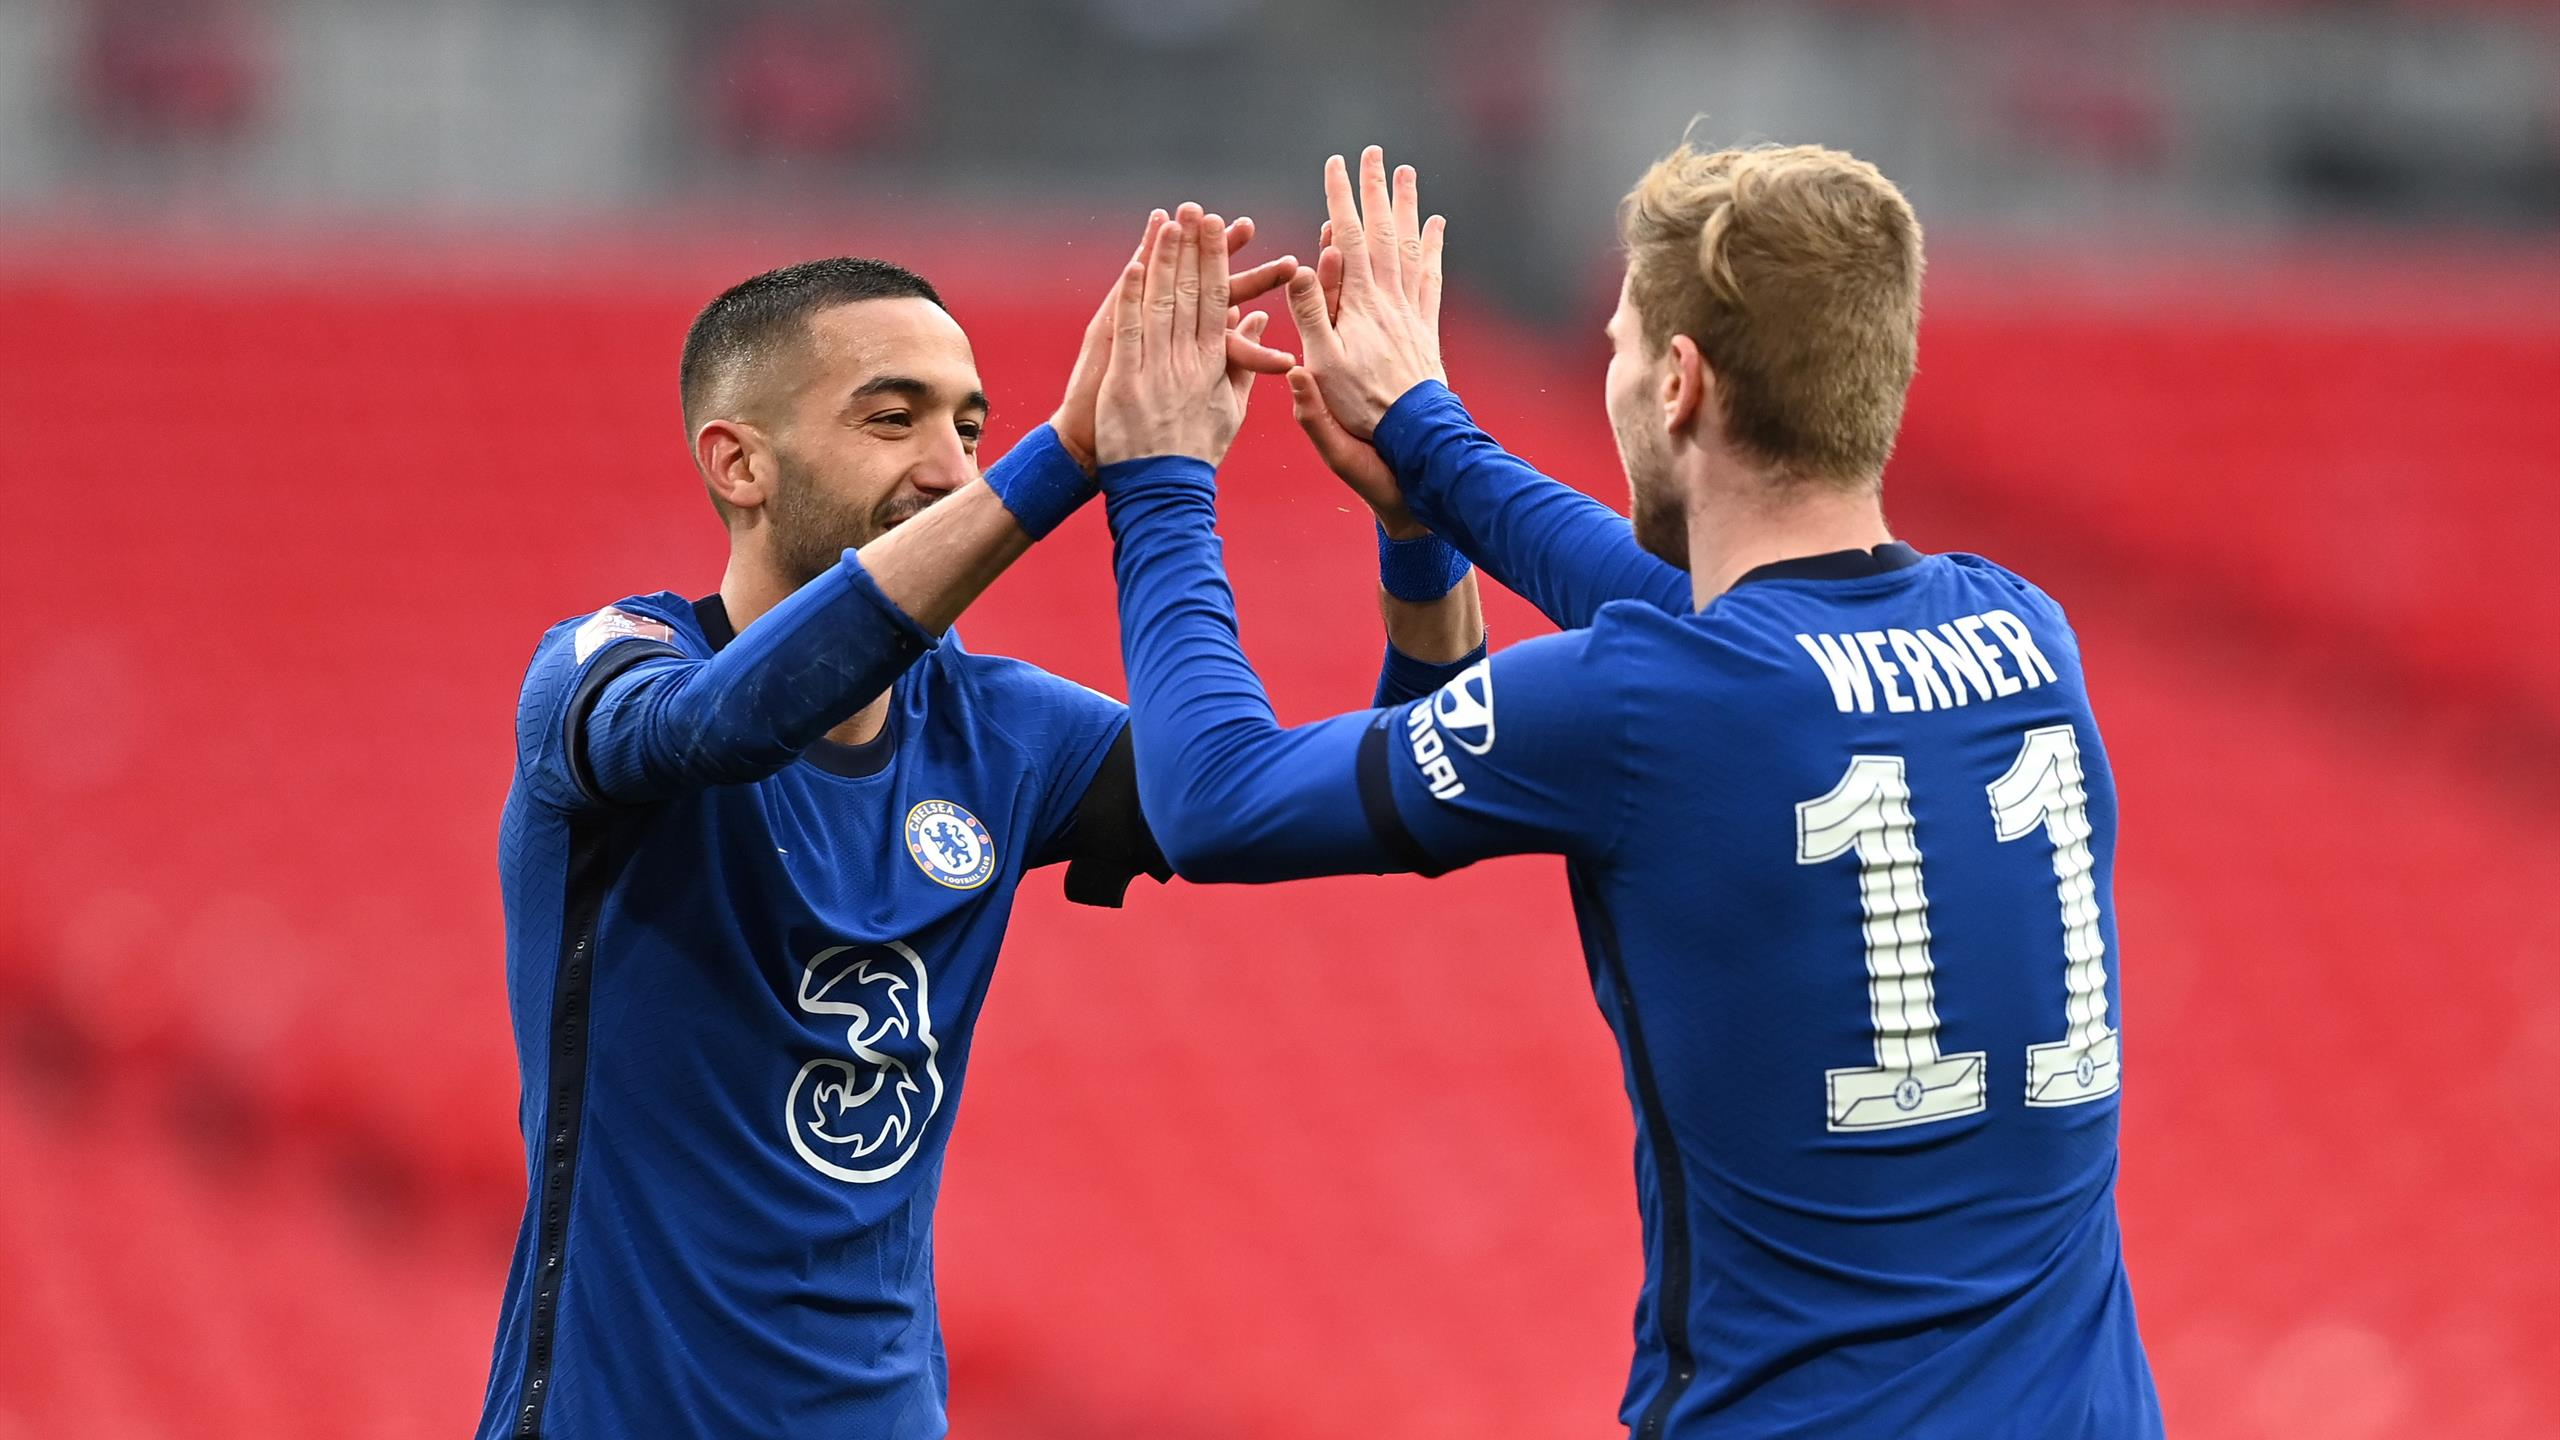 Football news - Chelsea reach the FA Cup final again to end Manchester City  quadruple dream - Eurosport